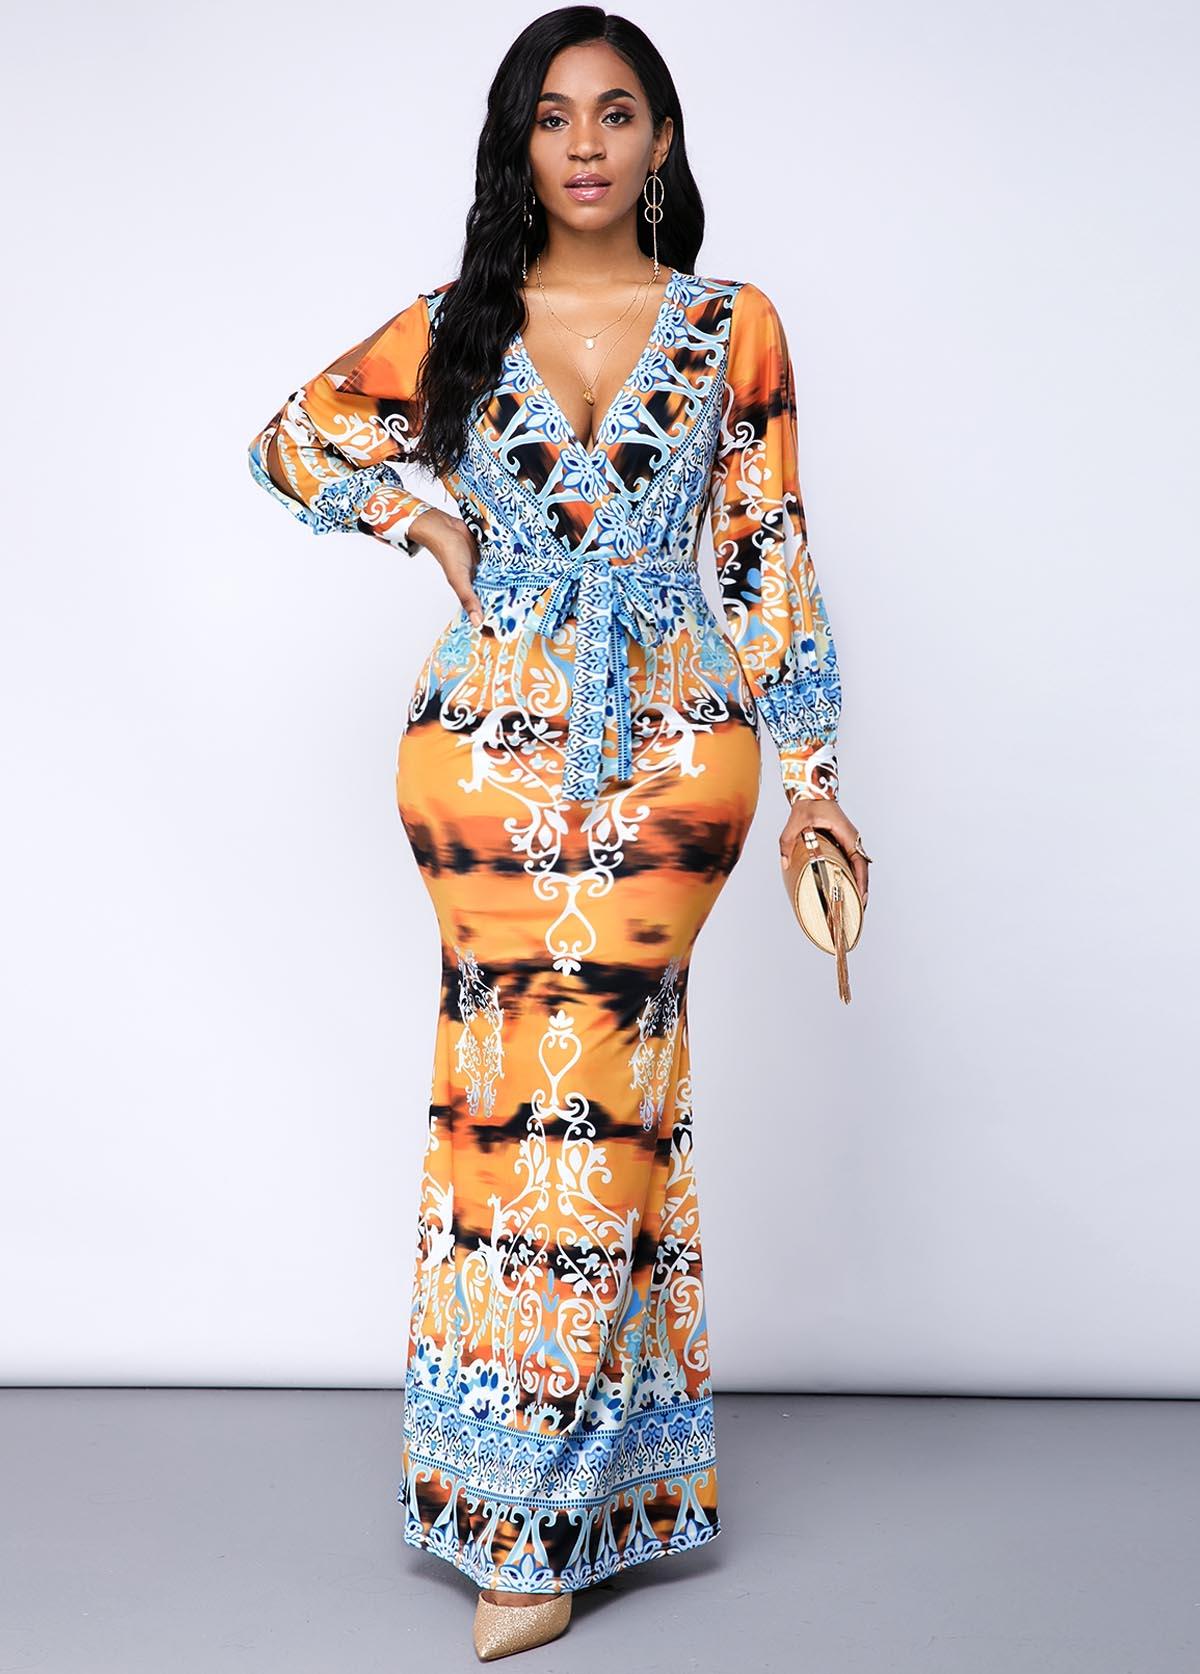 ROTITA Tribal Print Plunging Neck Belted Dress